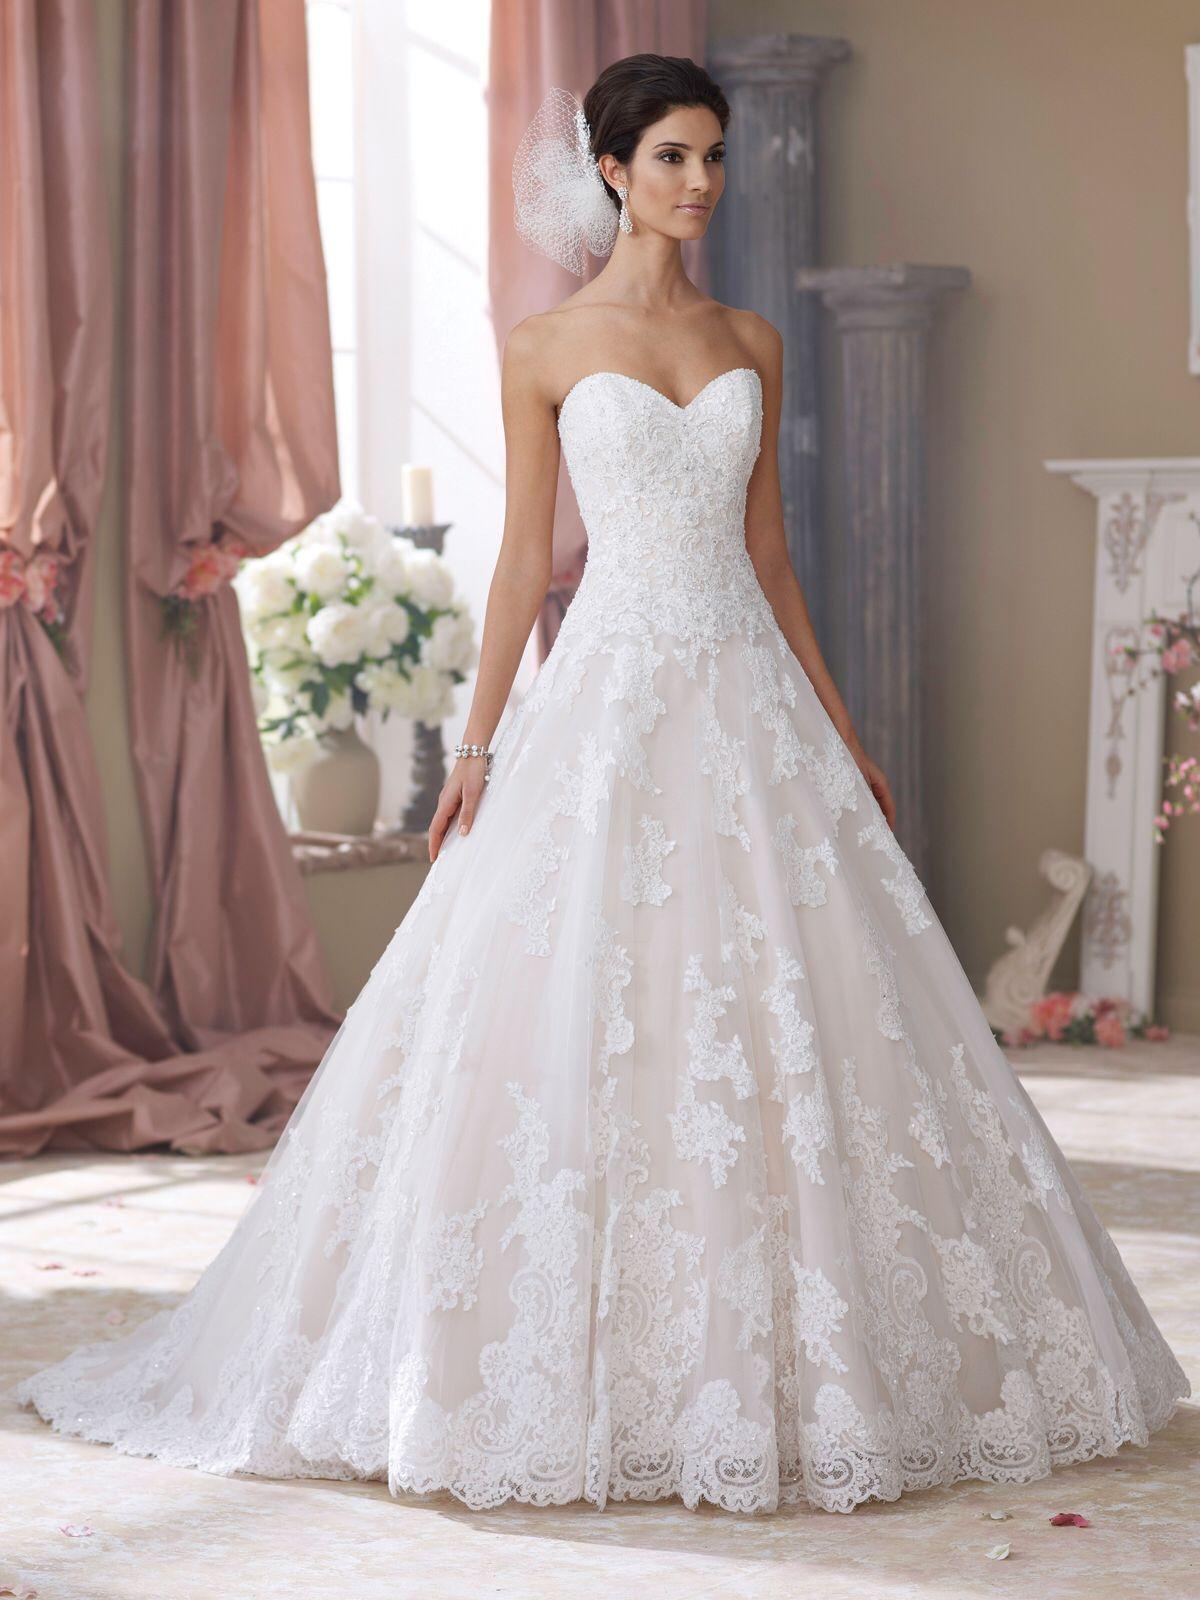 Wedding dresses with gold  David Tutera dream gown  Wedding dresses  Pinterest  David